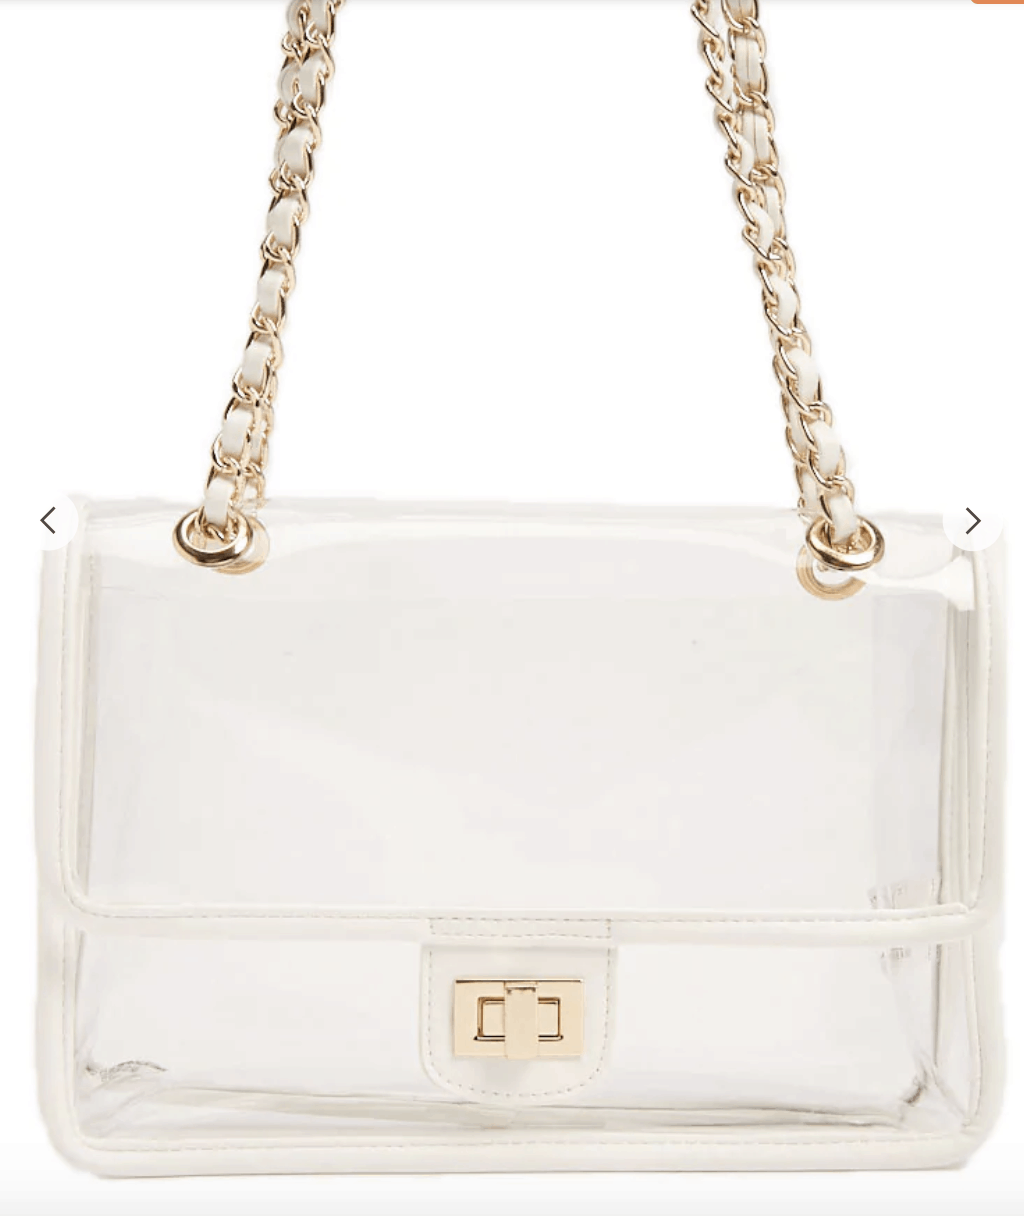 Clear handbag with chain strap - cute spring handbags on a budget